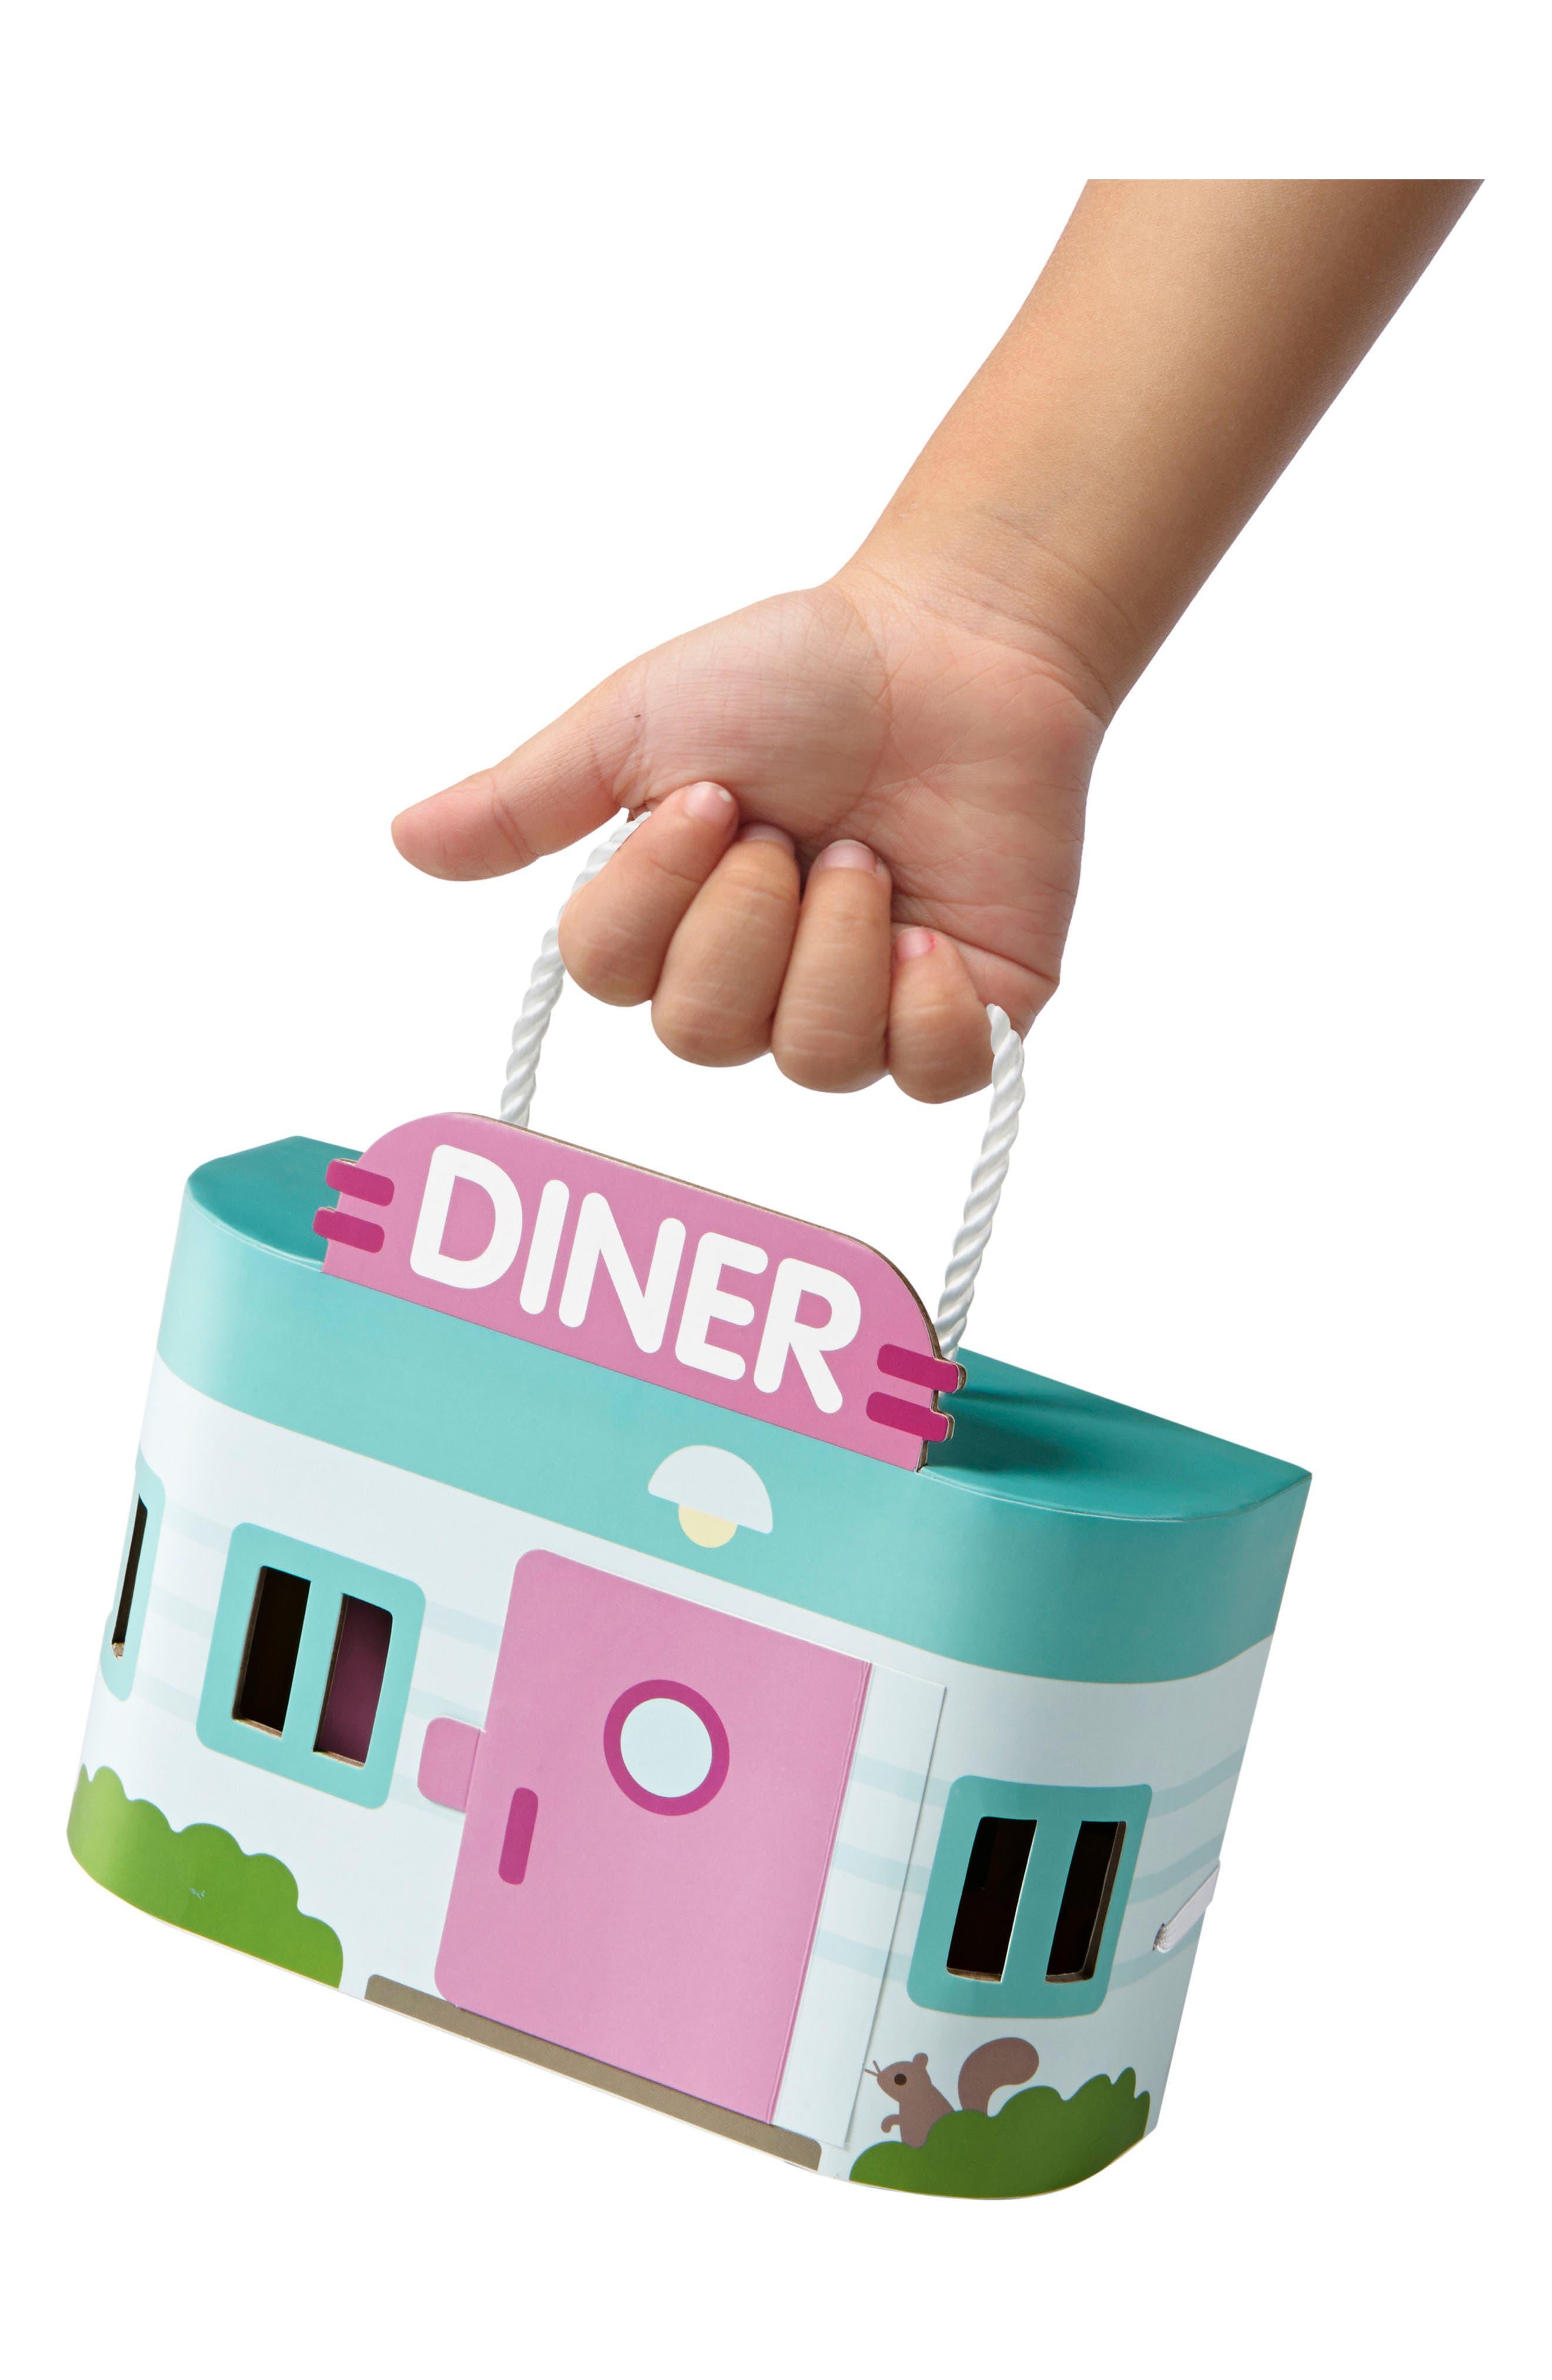 Jack's Diner Portable Play Set,                             Alternate thumbnail 2, color,                             MULTI